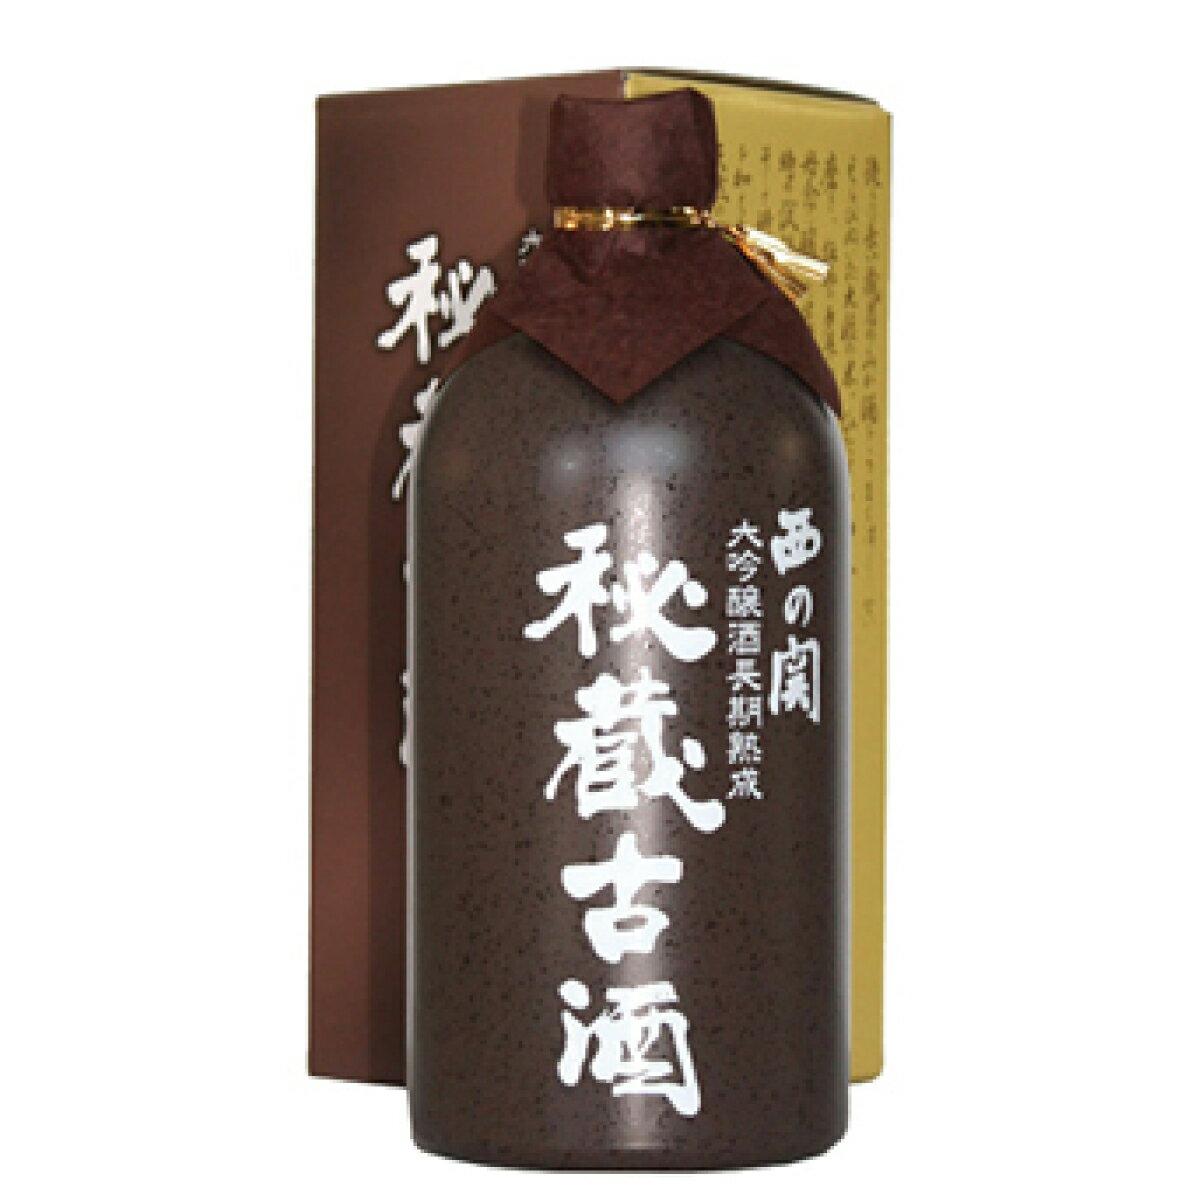 西の関 秘蔵古酒 720ml 大吟醸【RCP】